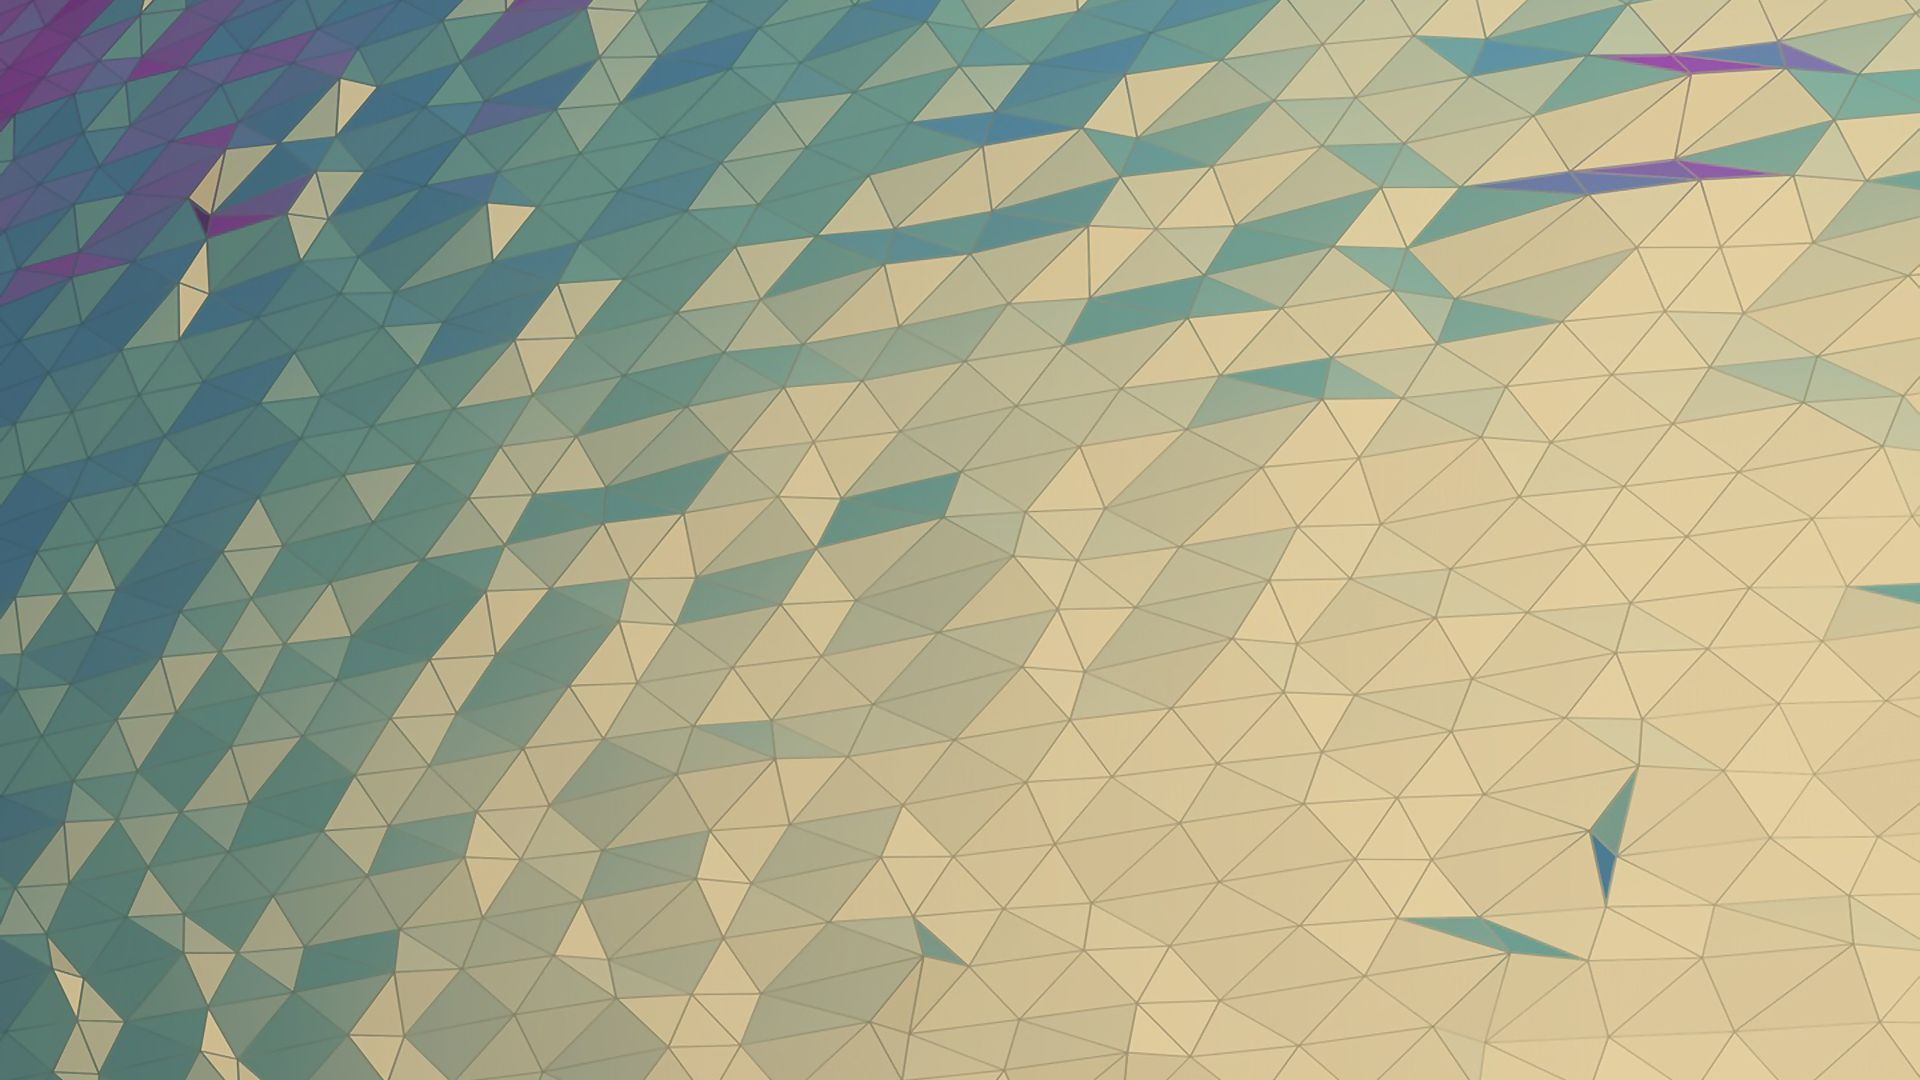 Geometric Abstract Wallpaper Wallpapersafari Geometric Wallpaper Full Hd High Resolution Wallpaper Full Size Geometric